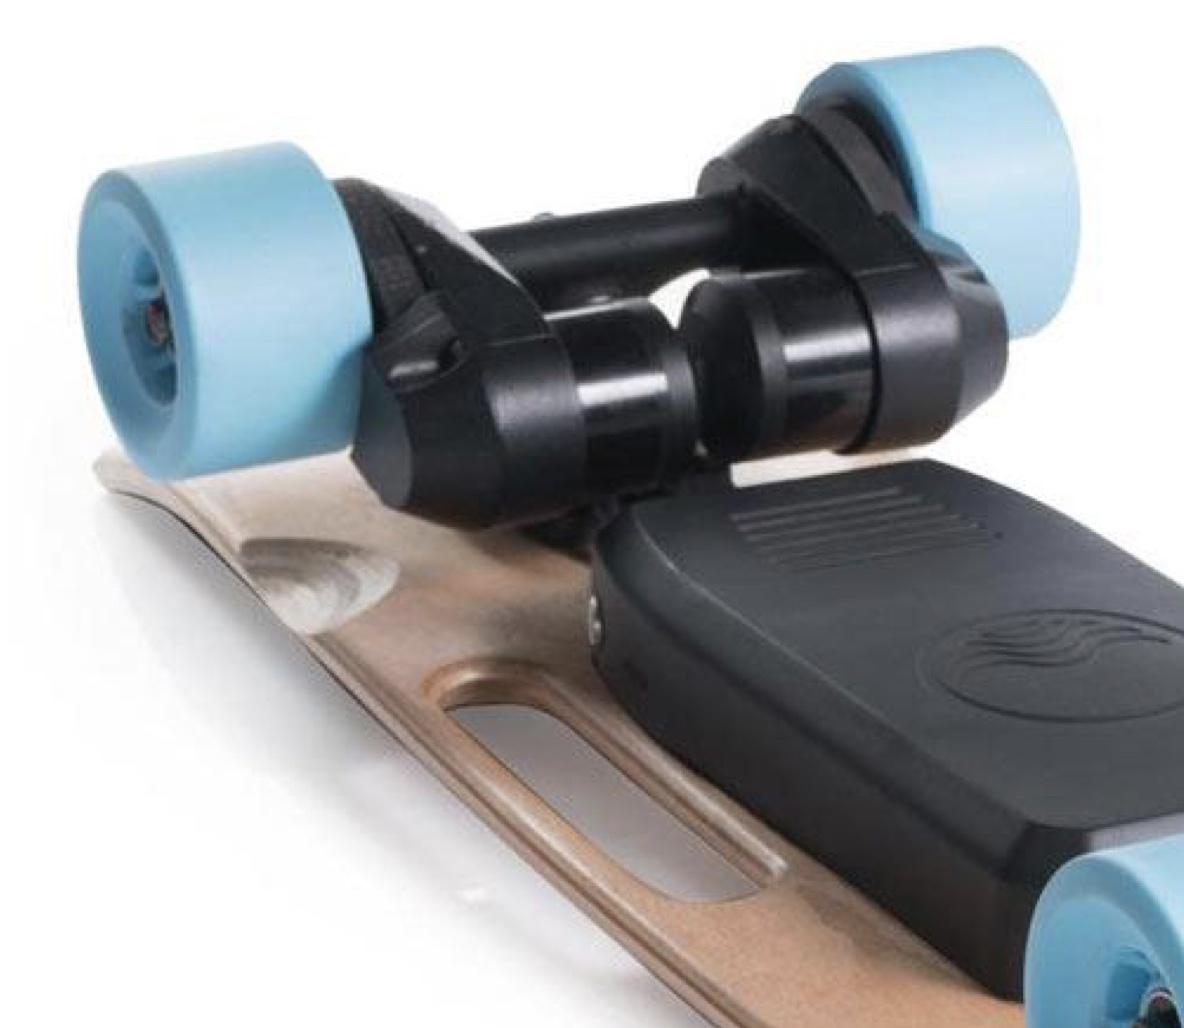 Riptide R1 Electric Skateboard Motors